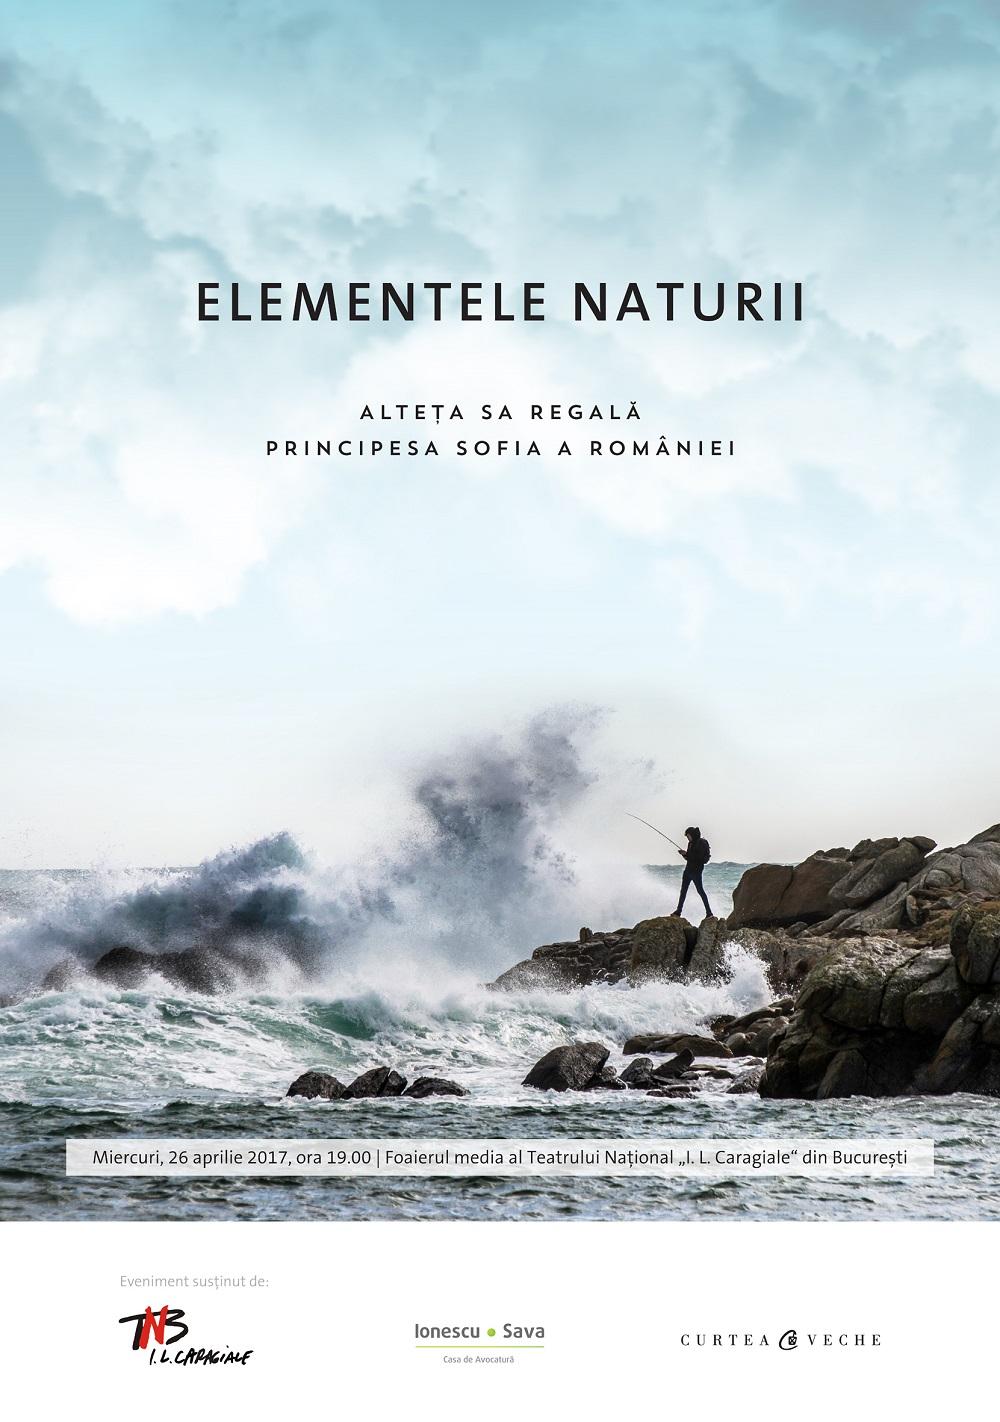 expozitie-elementele-naturii-afis-1